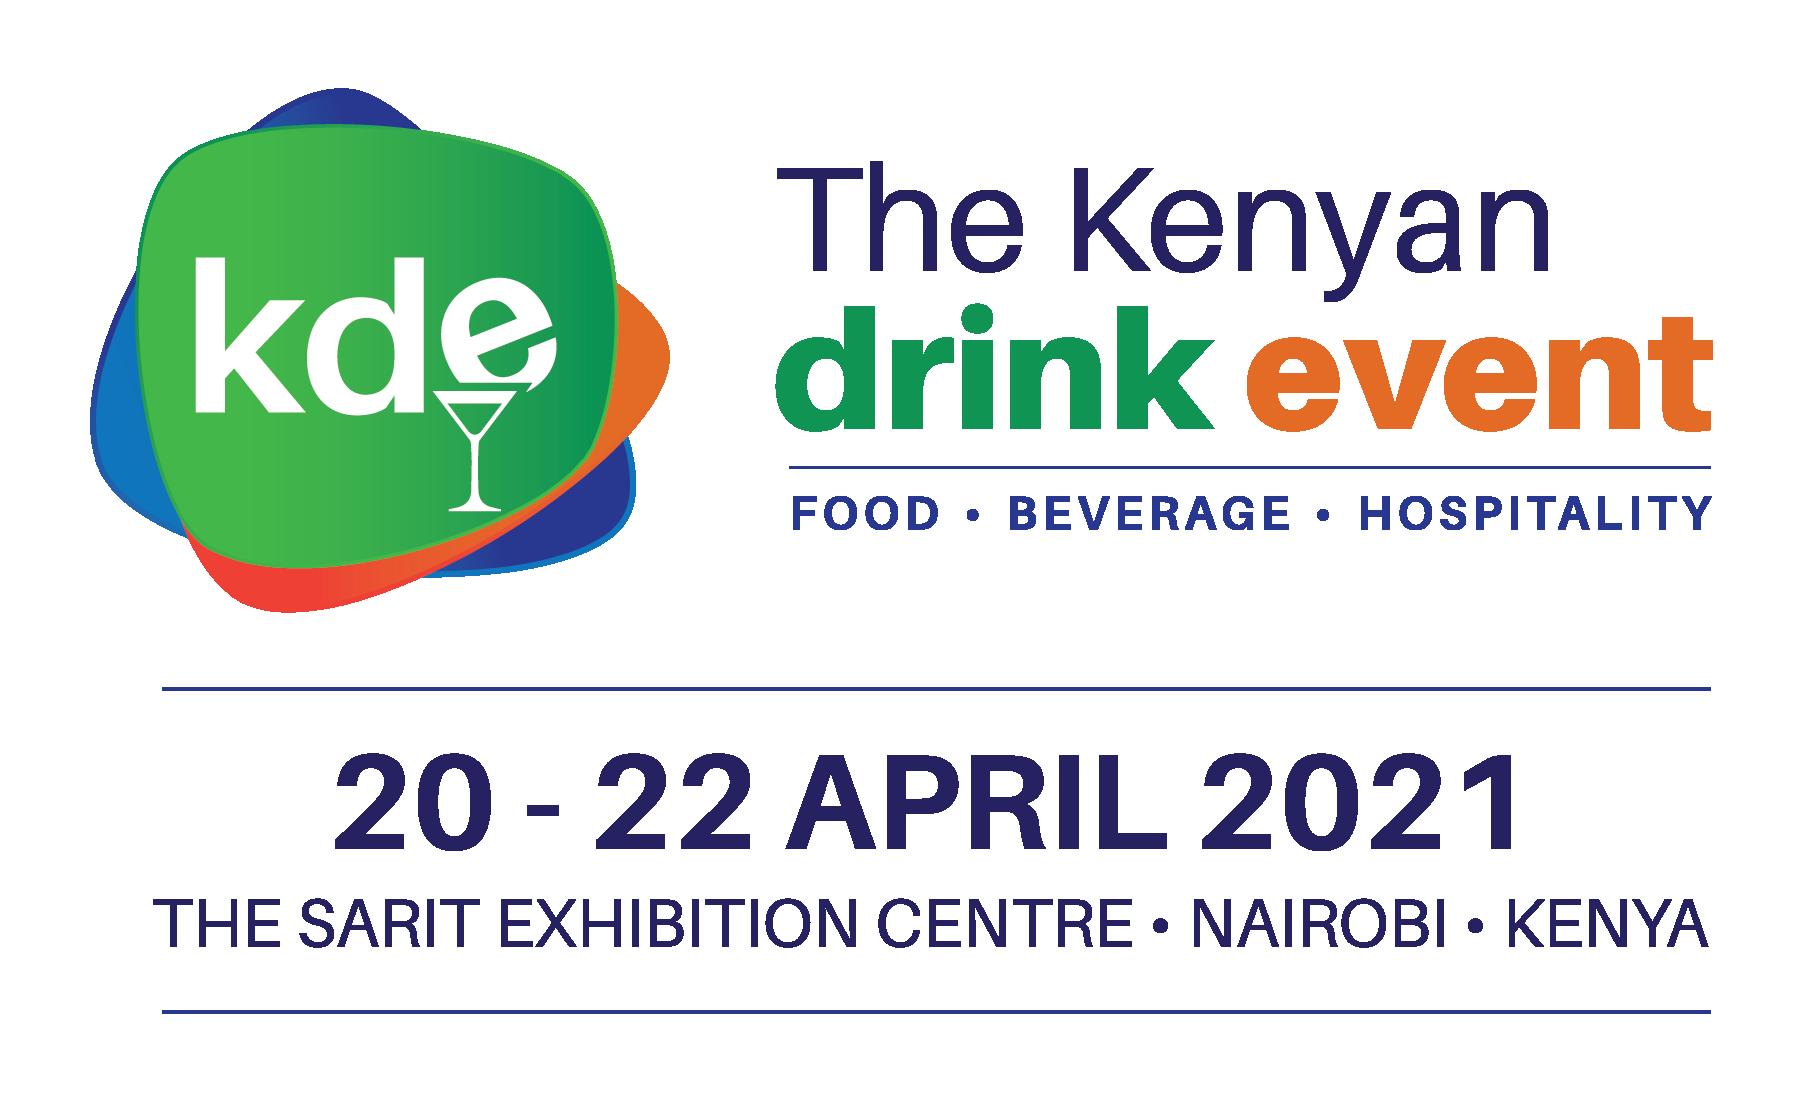 Kenyan Drink Event 2021